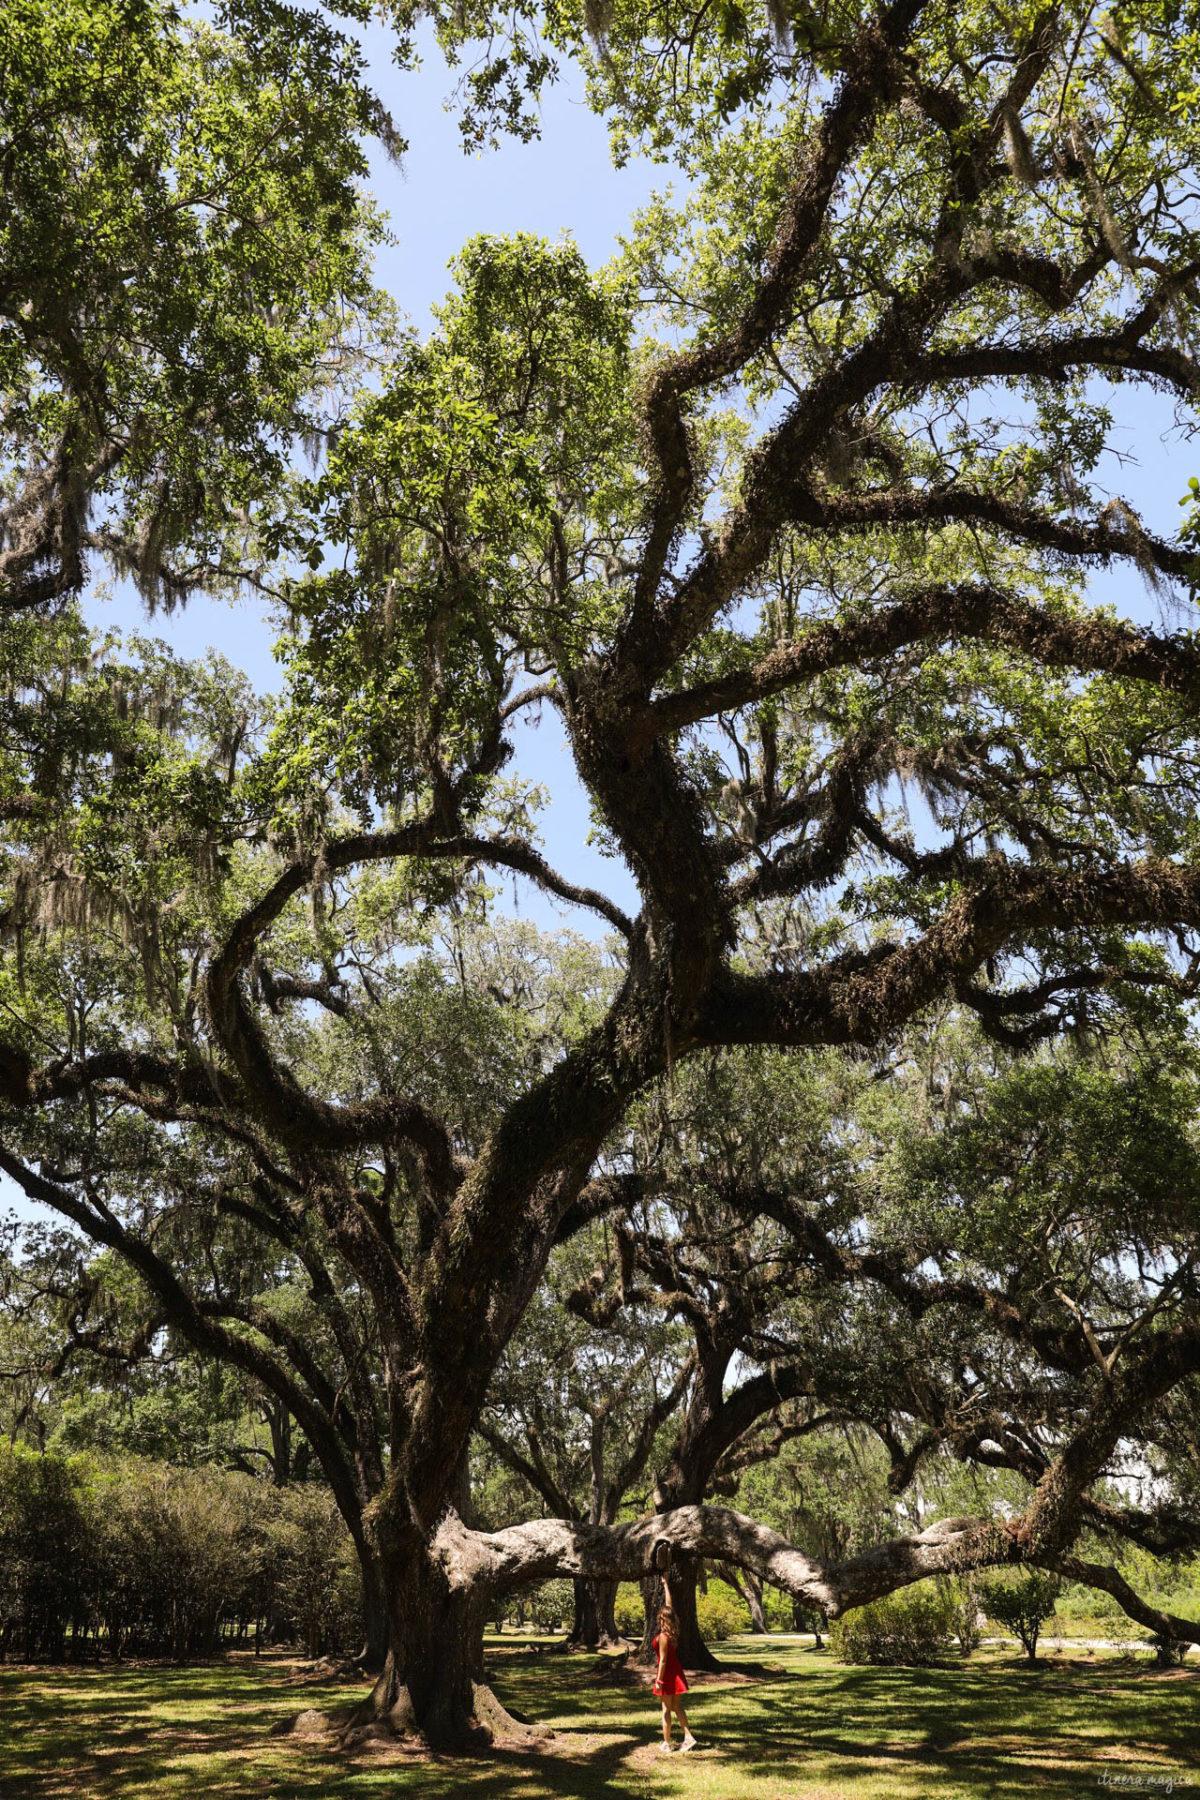 Avery Island, Louisiana. Les fabuleux chênes de Virginie d'Avery Island.